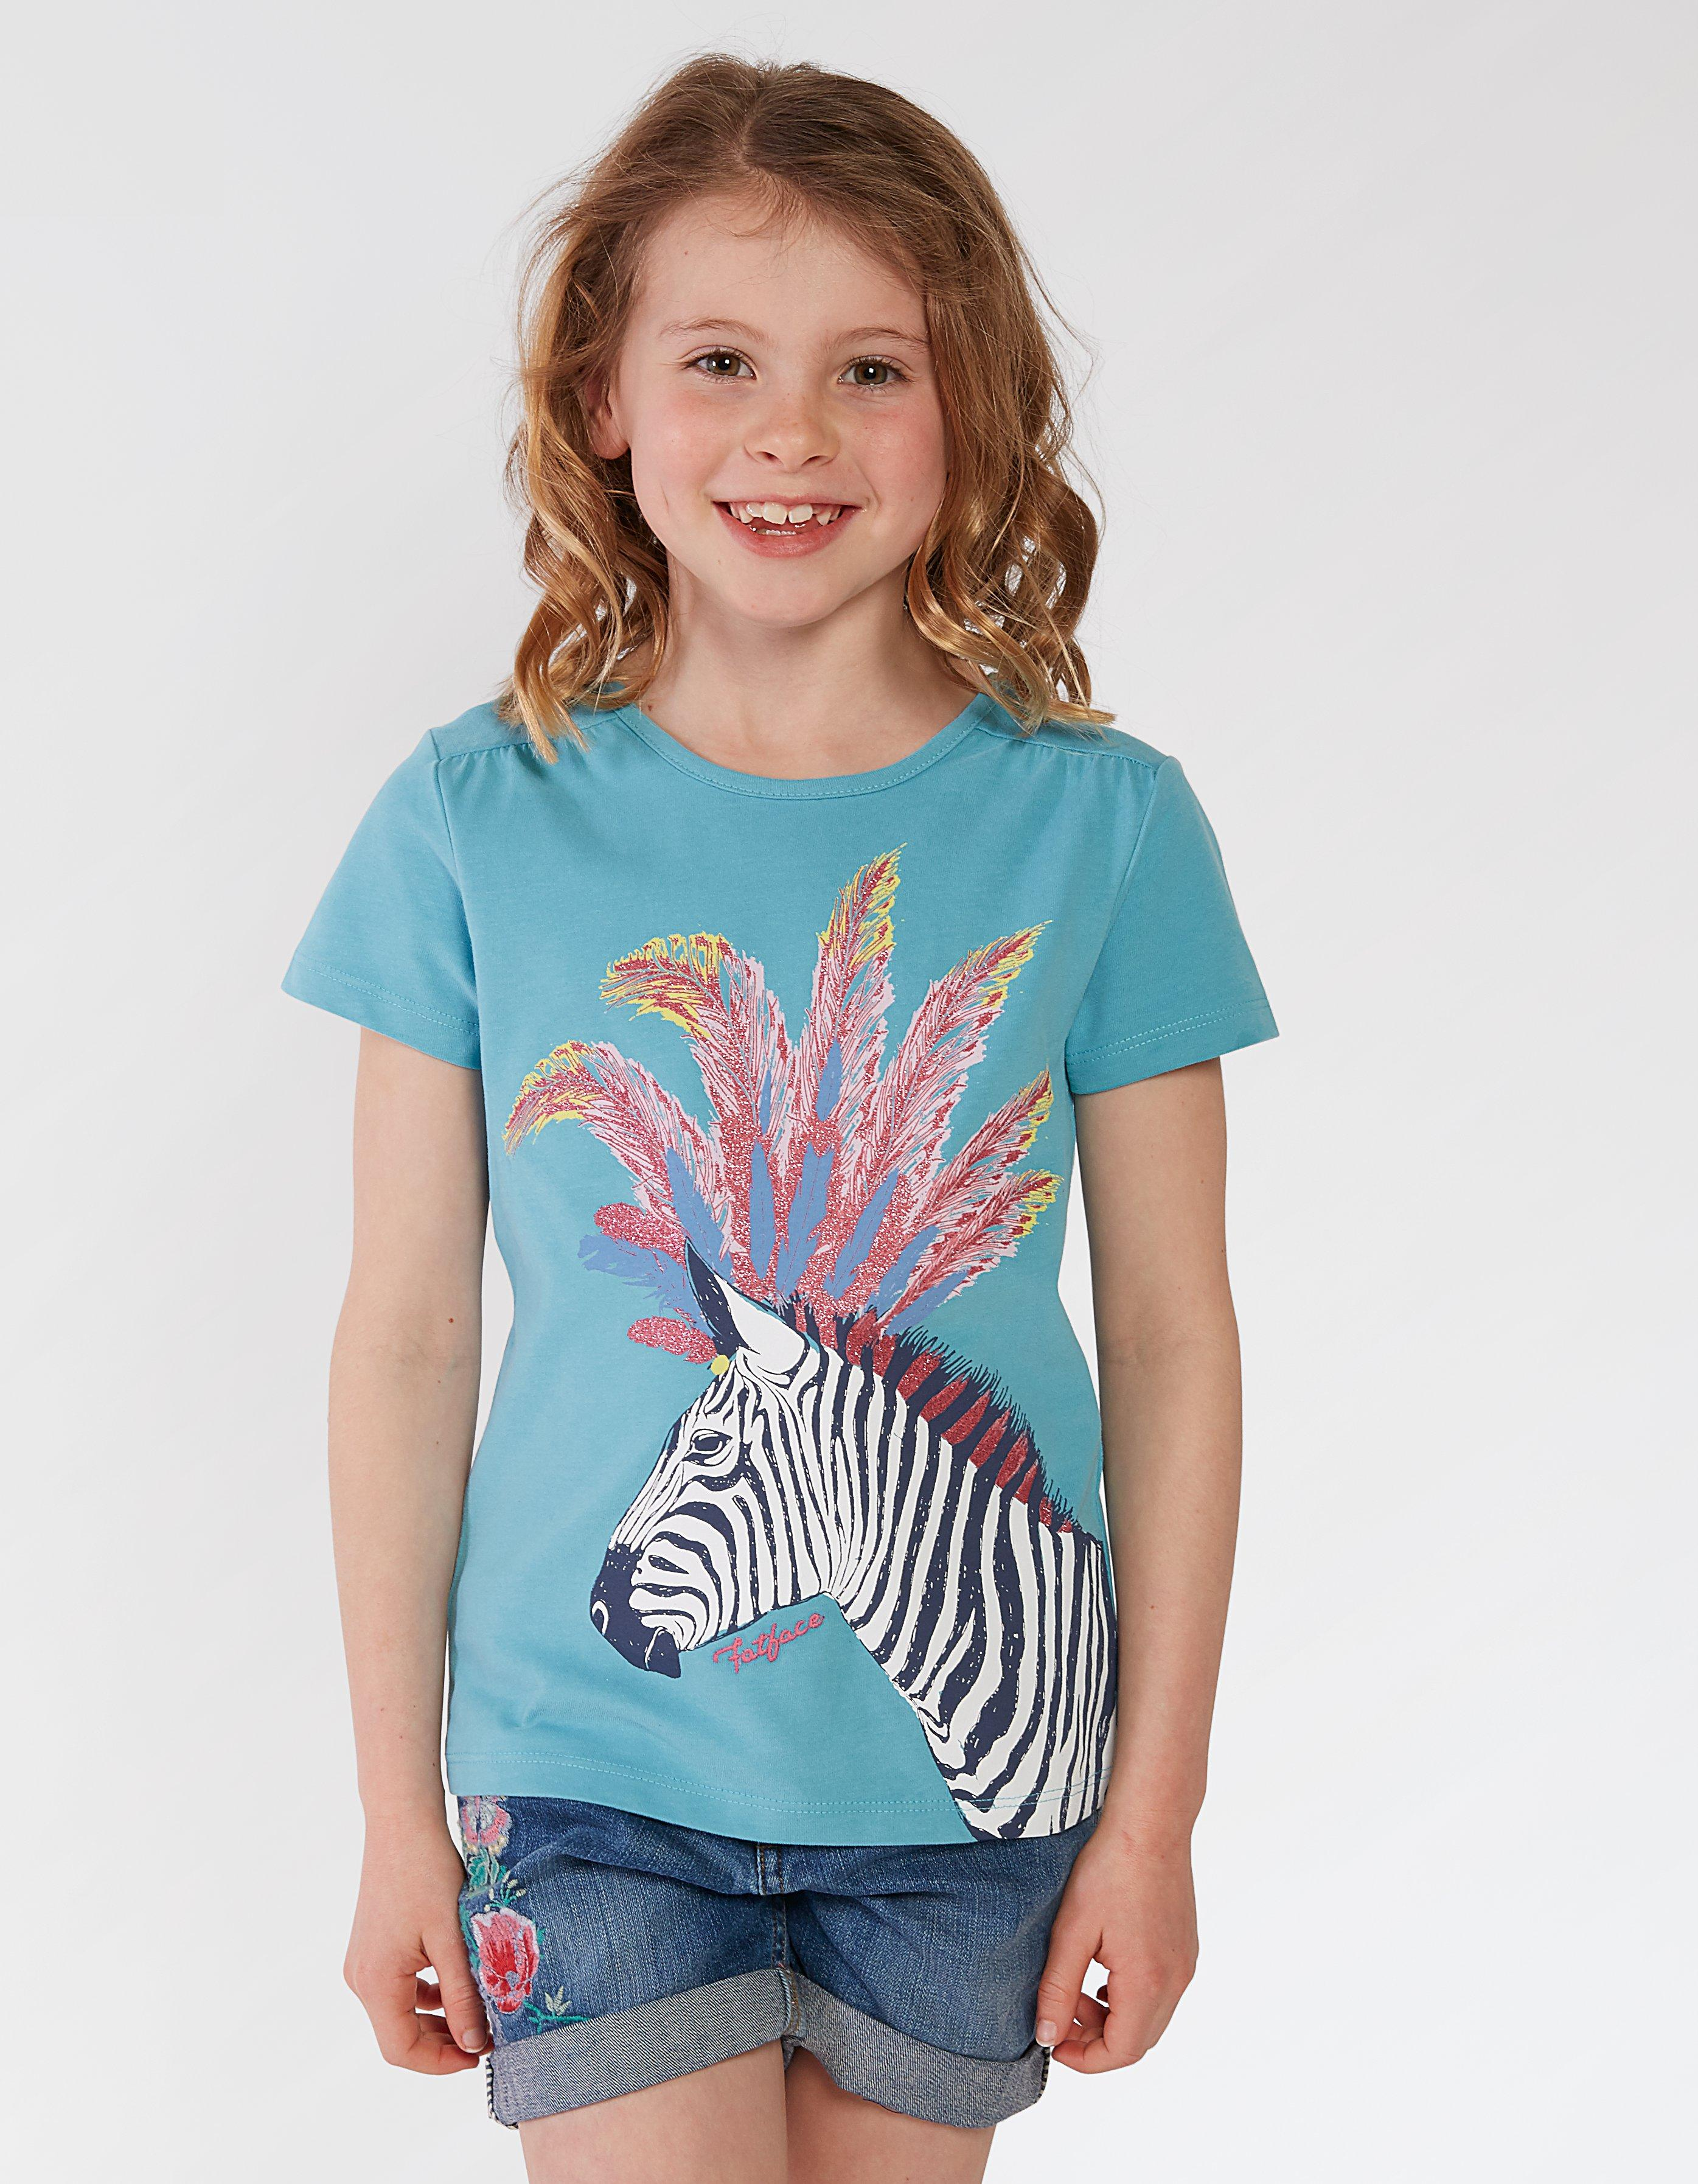 Zebra Graphic T Shirt